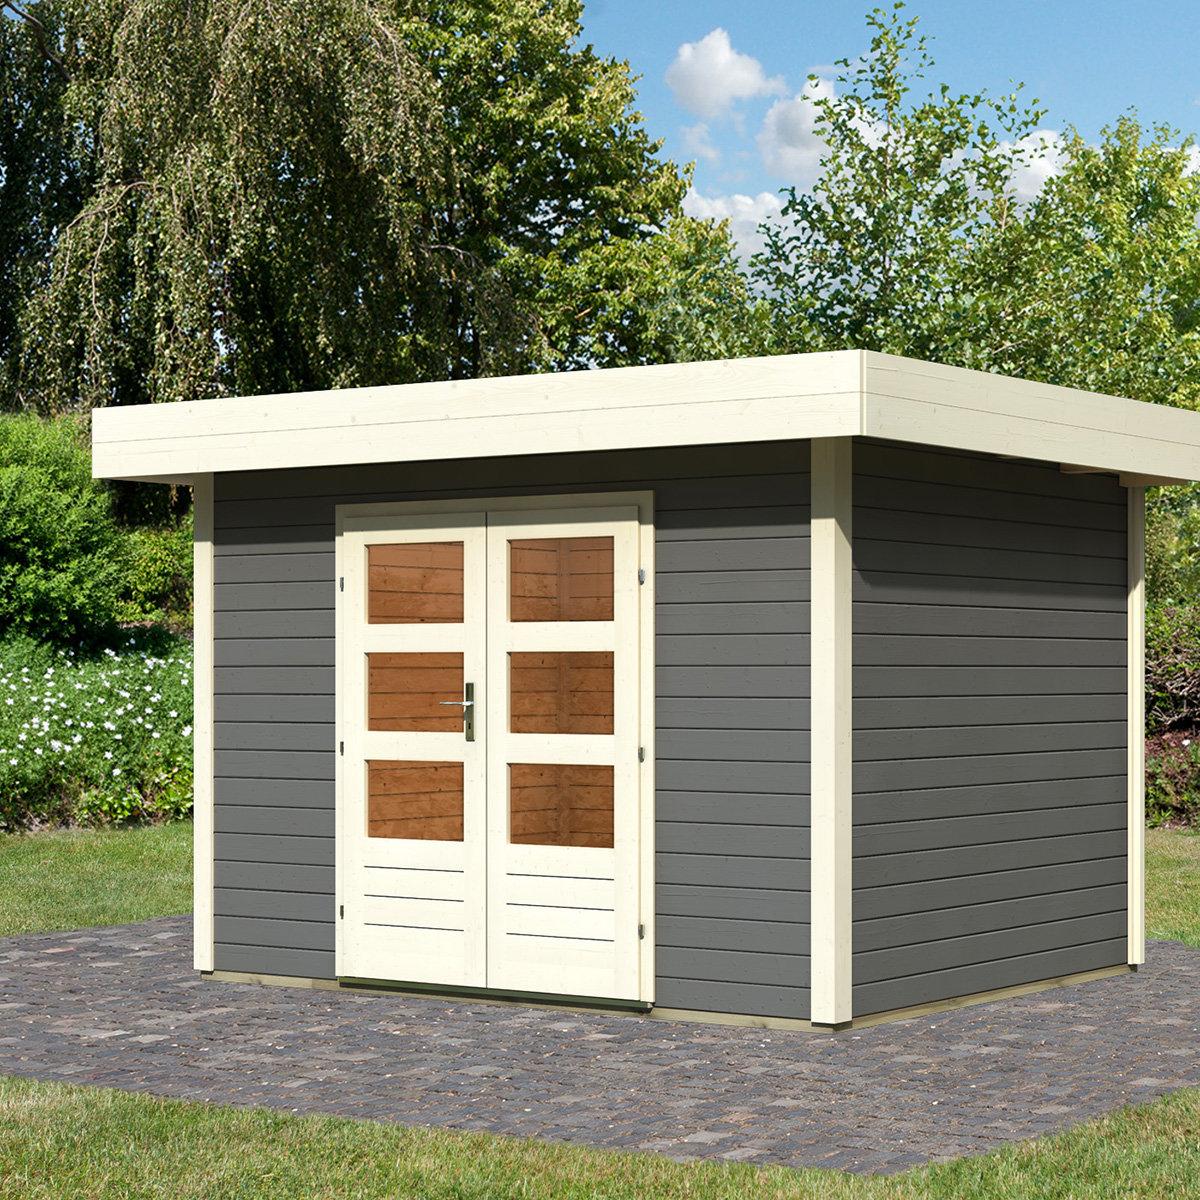 gartenhaus multi cube 3 my blog. Black Bedroom Furniture Sets. Home Design Ideas